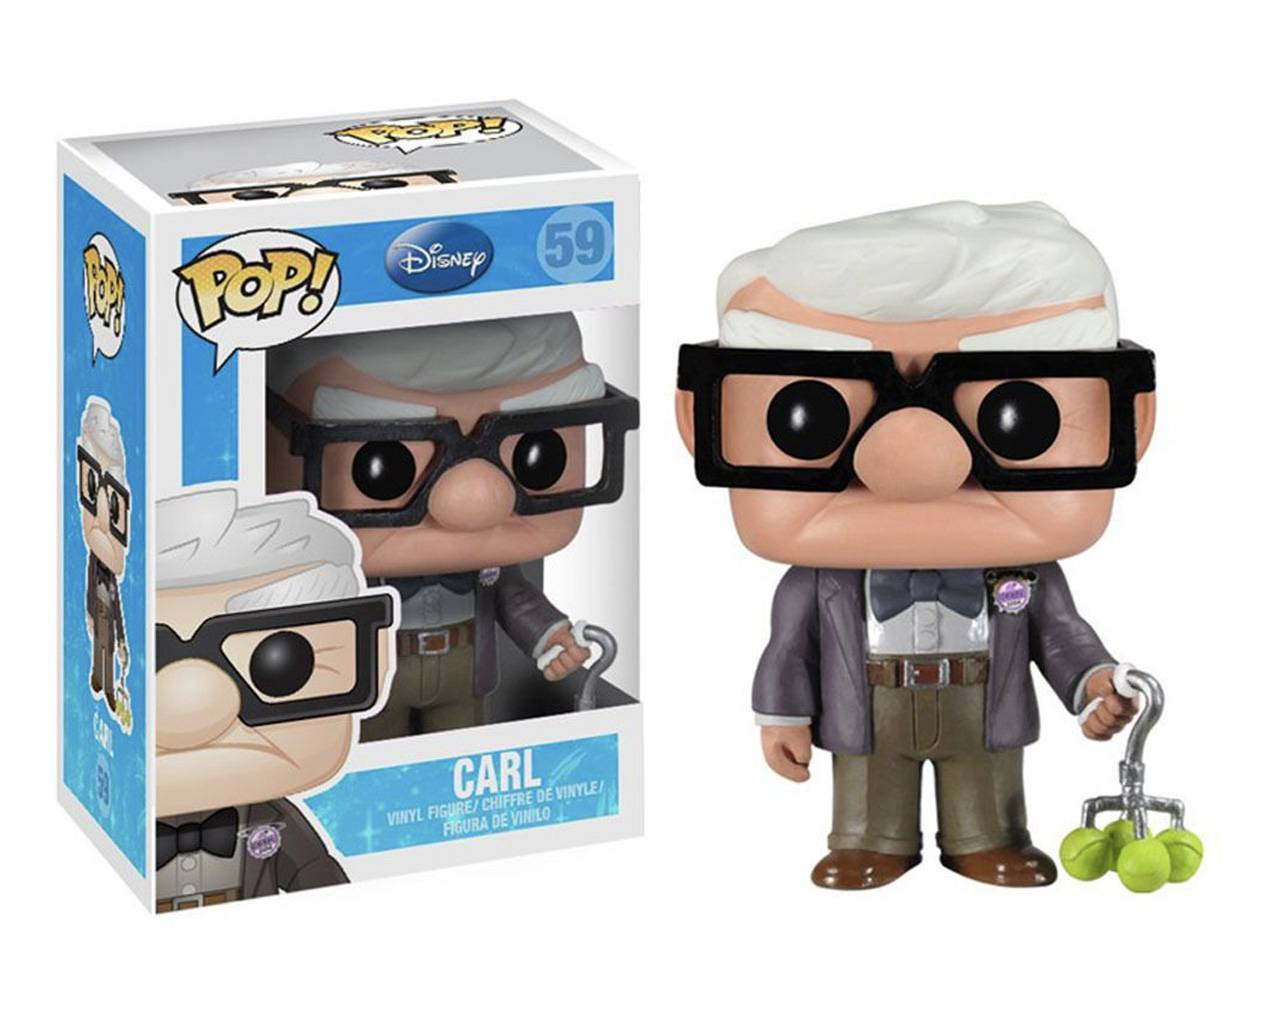 Carl (Up) Pop! Vinyl